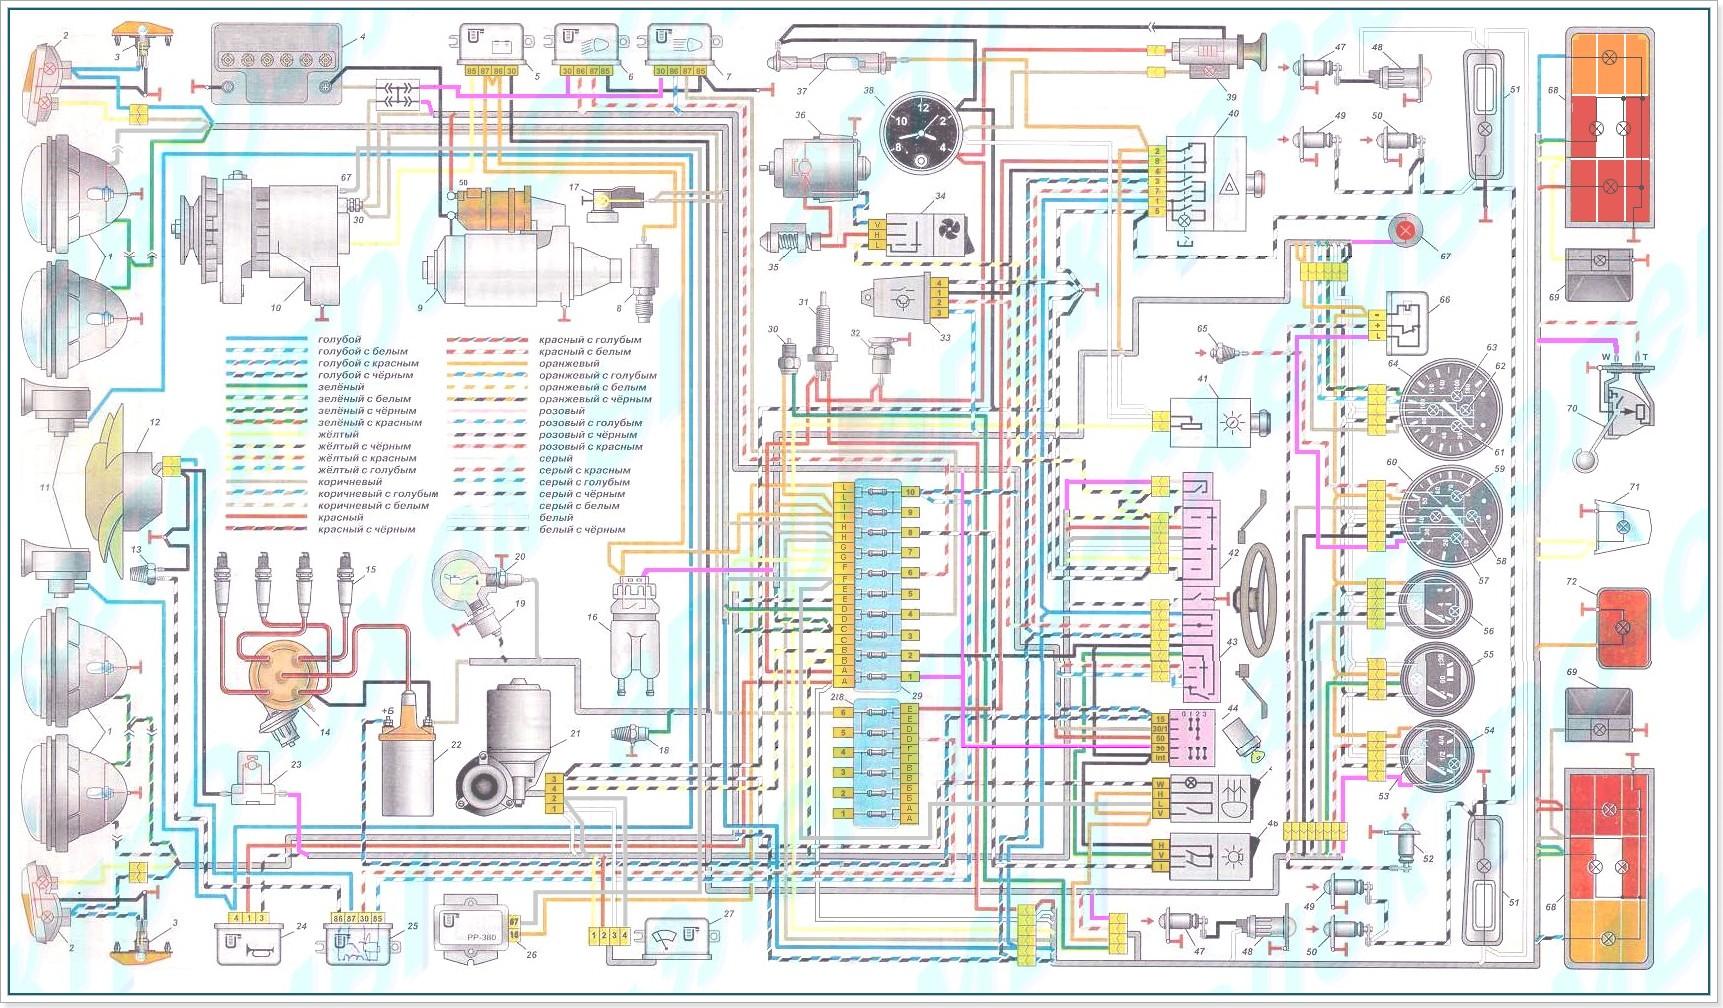 Нужна схема электропроводки на ваз 2106 на автомобильном форуме схема электоропроводки на ваз 2106.